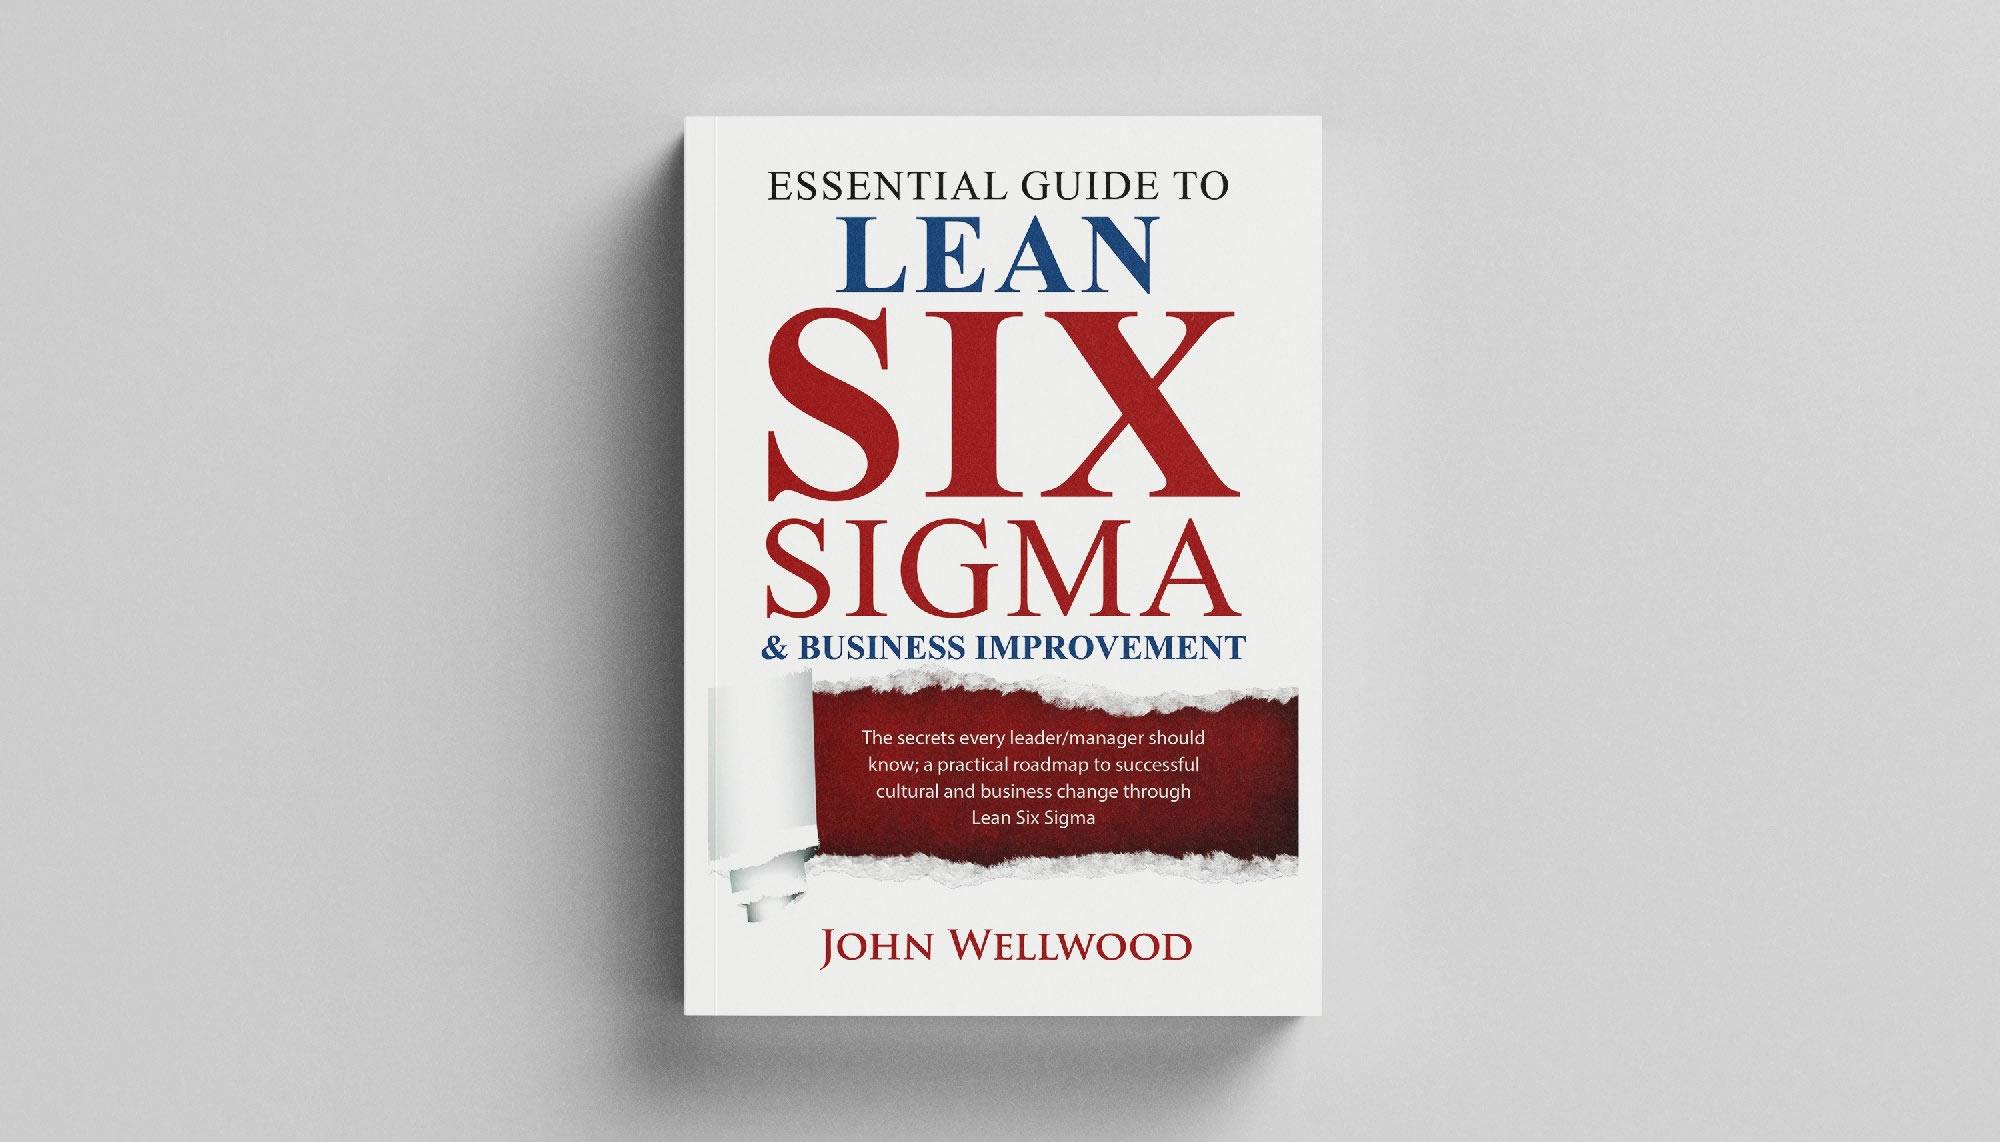 Essential Guide to Lean Six Sigma Book